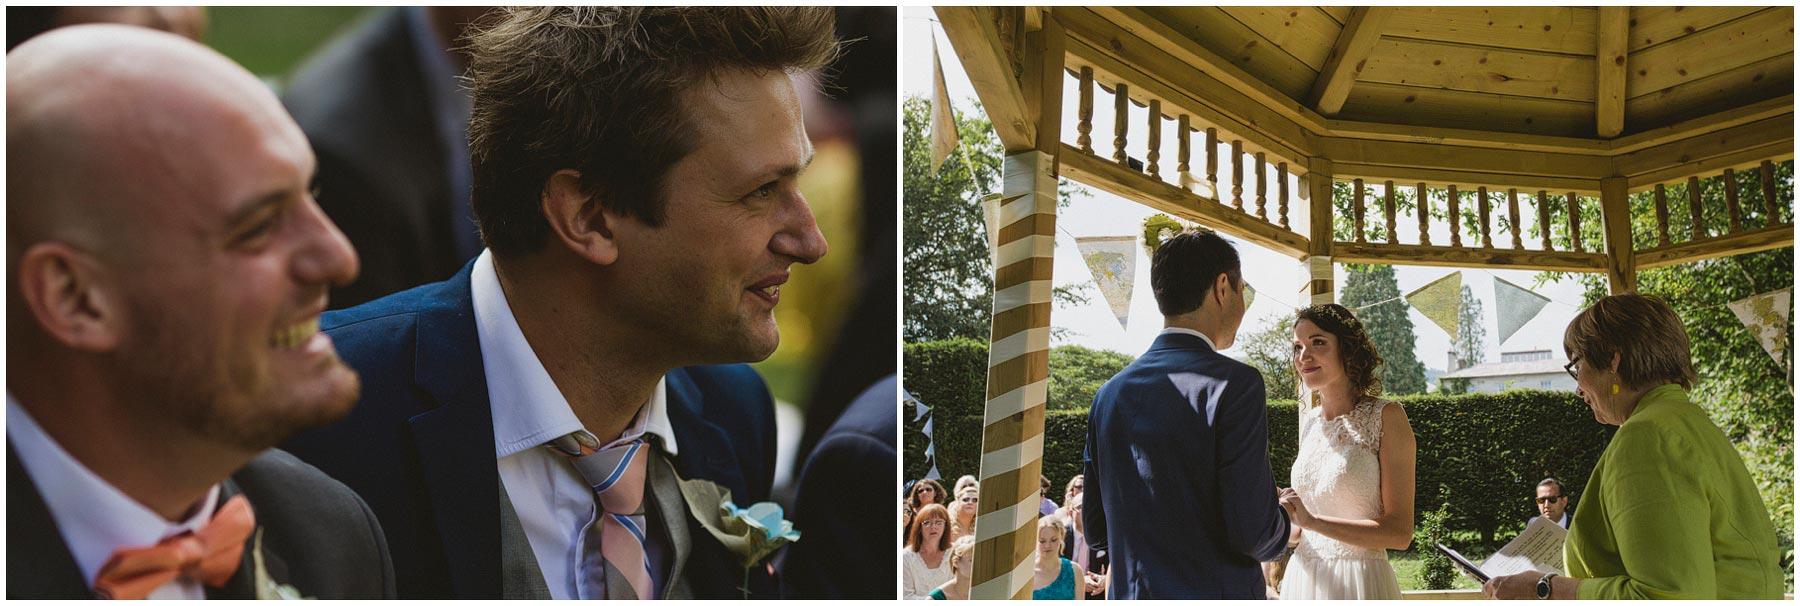 Colehayes-Park-Wedding-Photography_0072